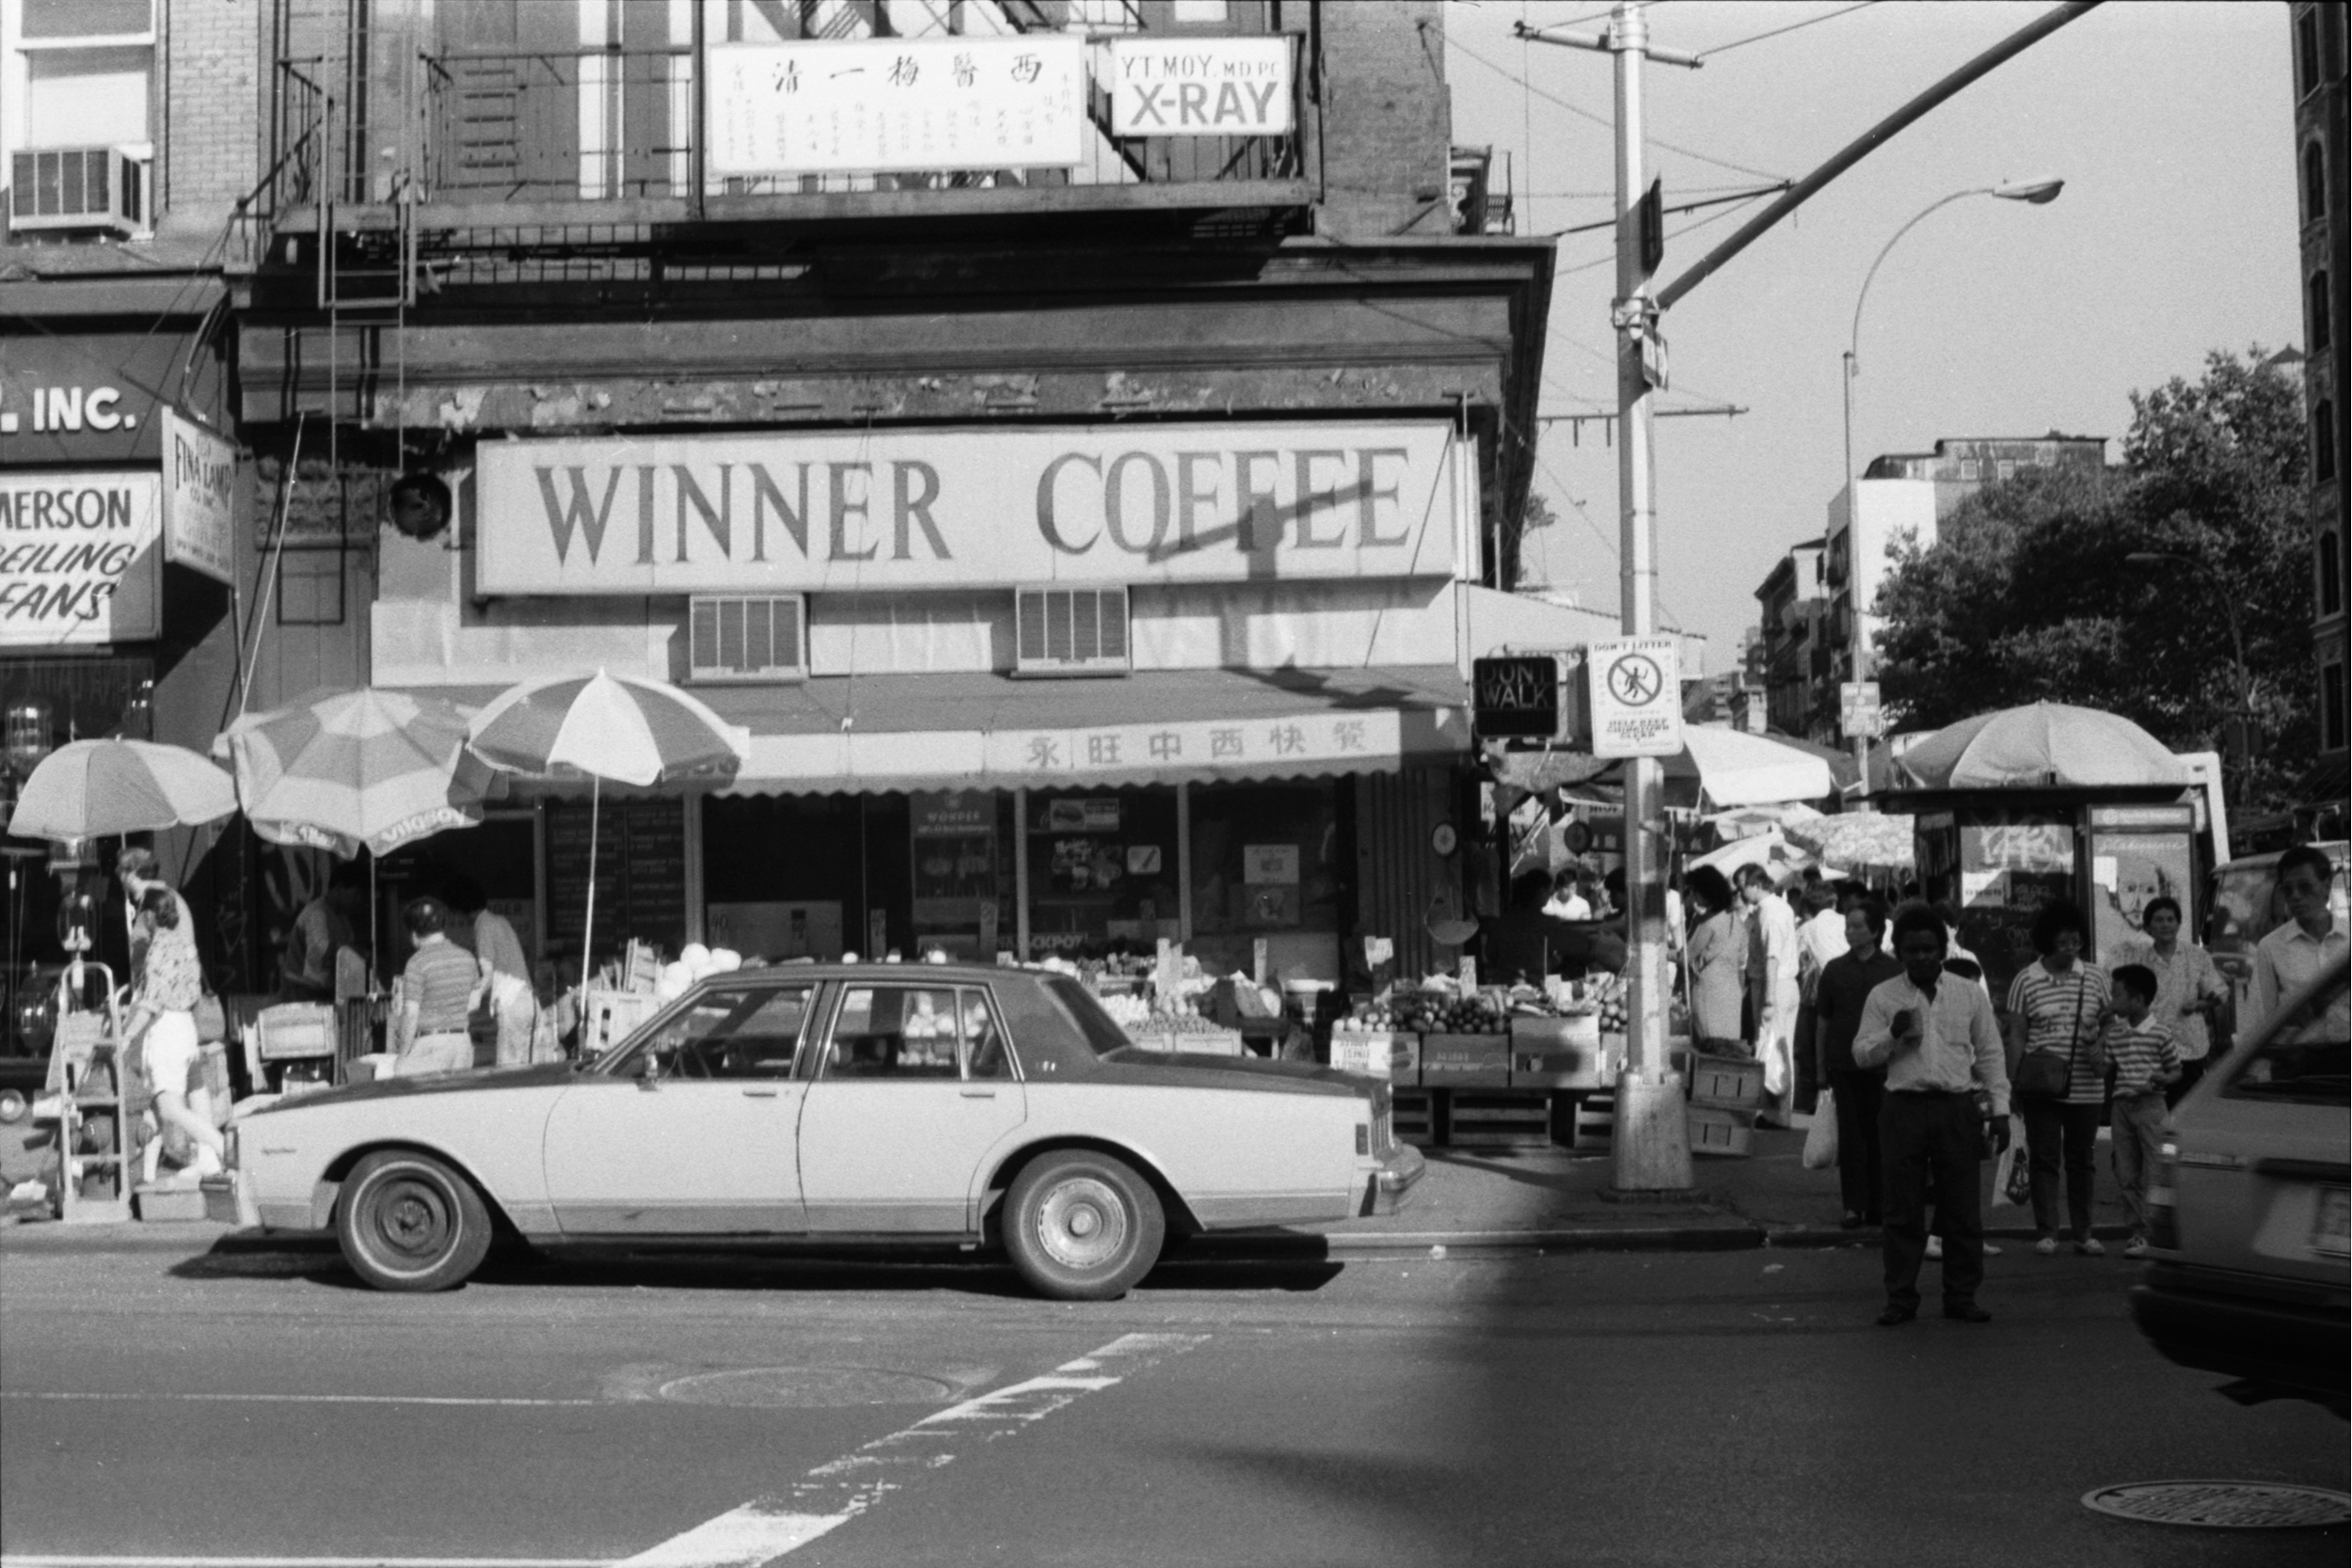 Bowery near Grand Street, 1989